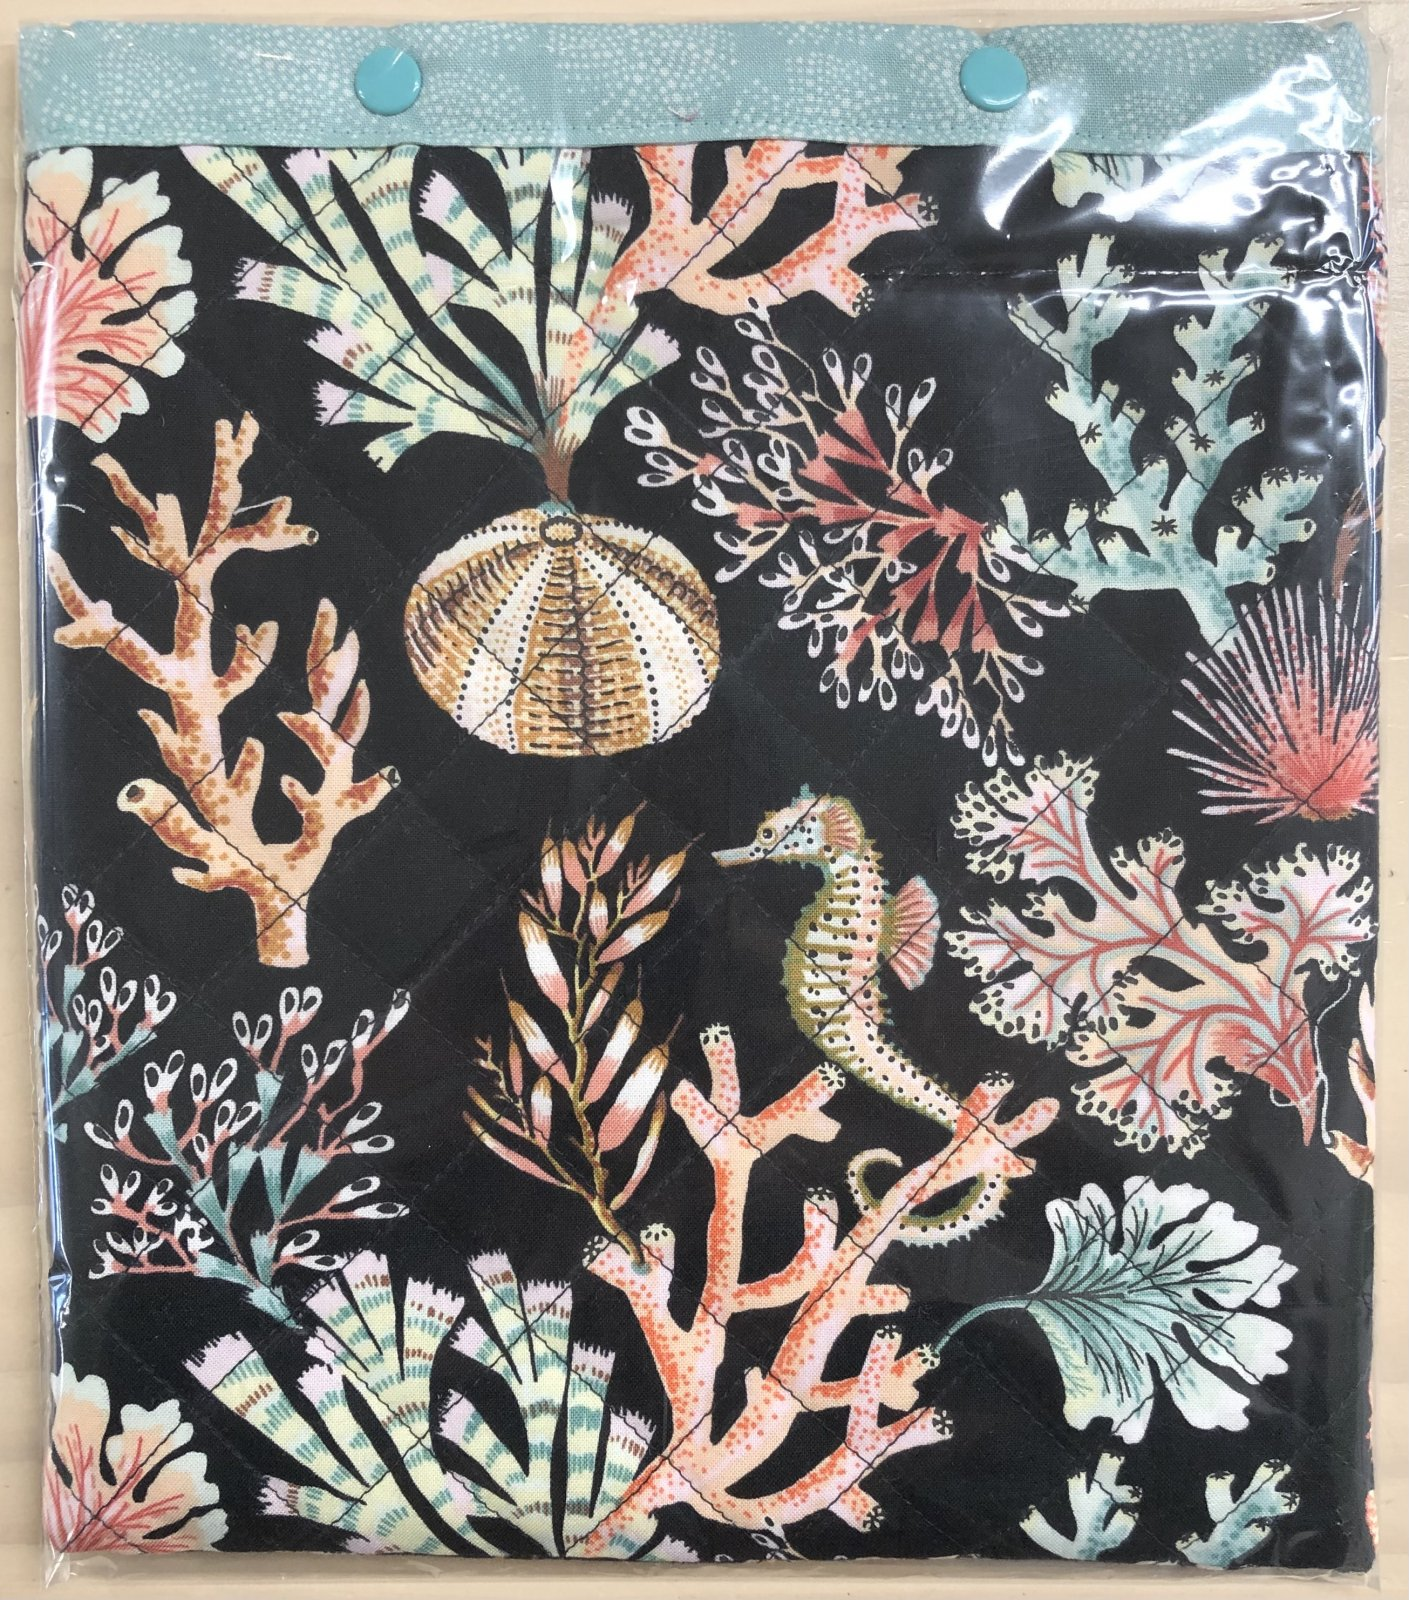 Magnifier Light Covers  Sea Botanica